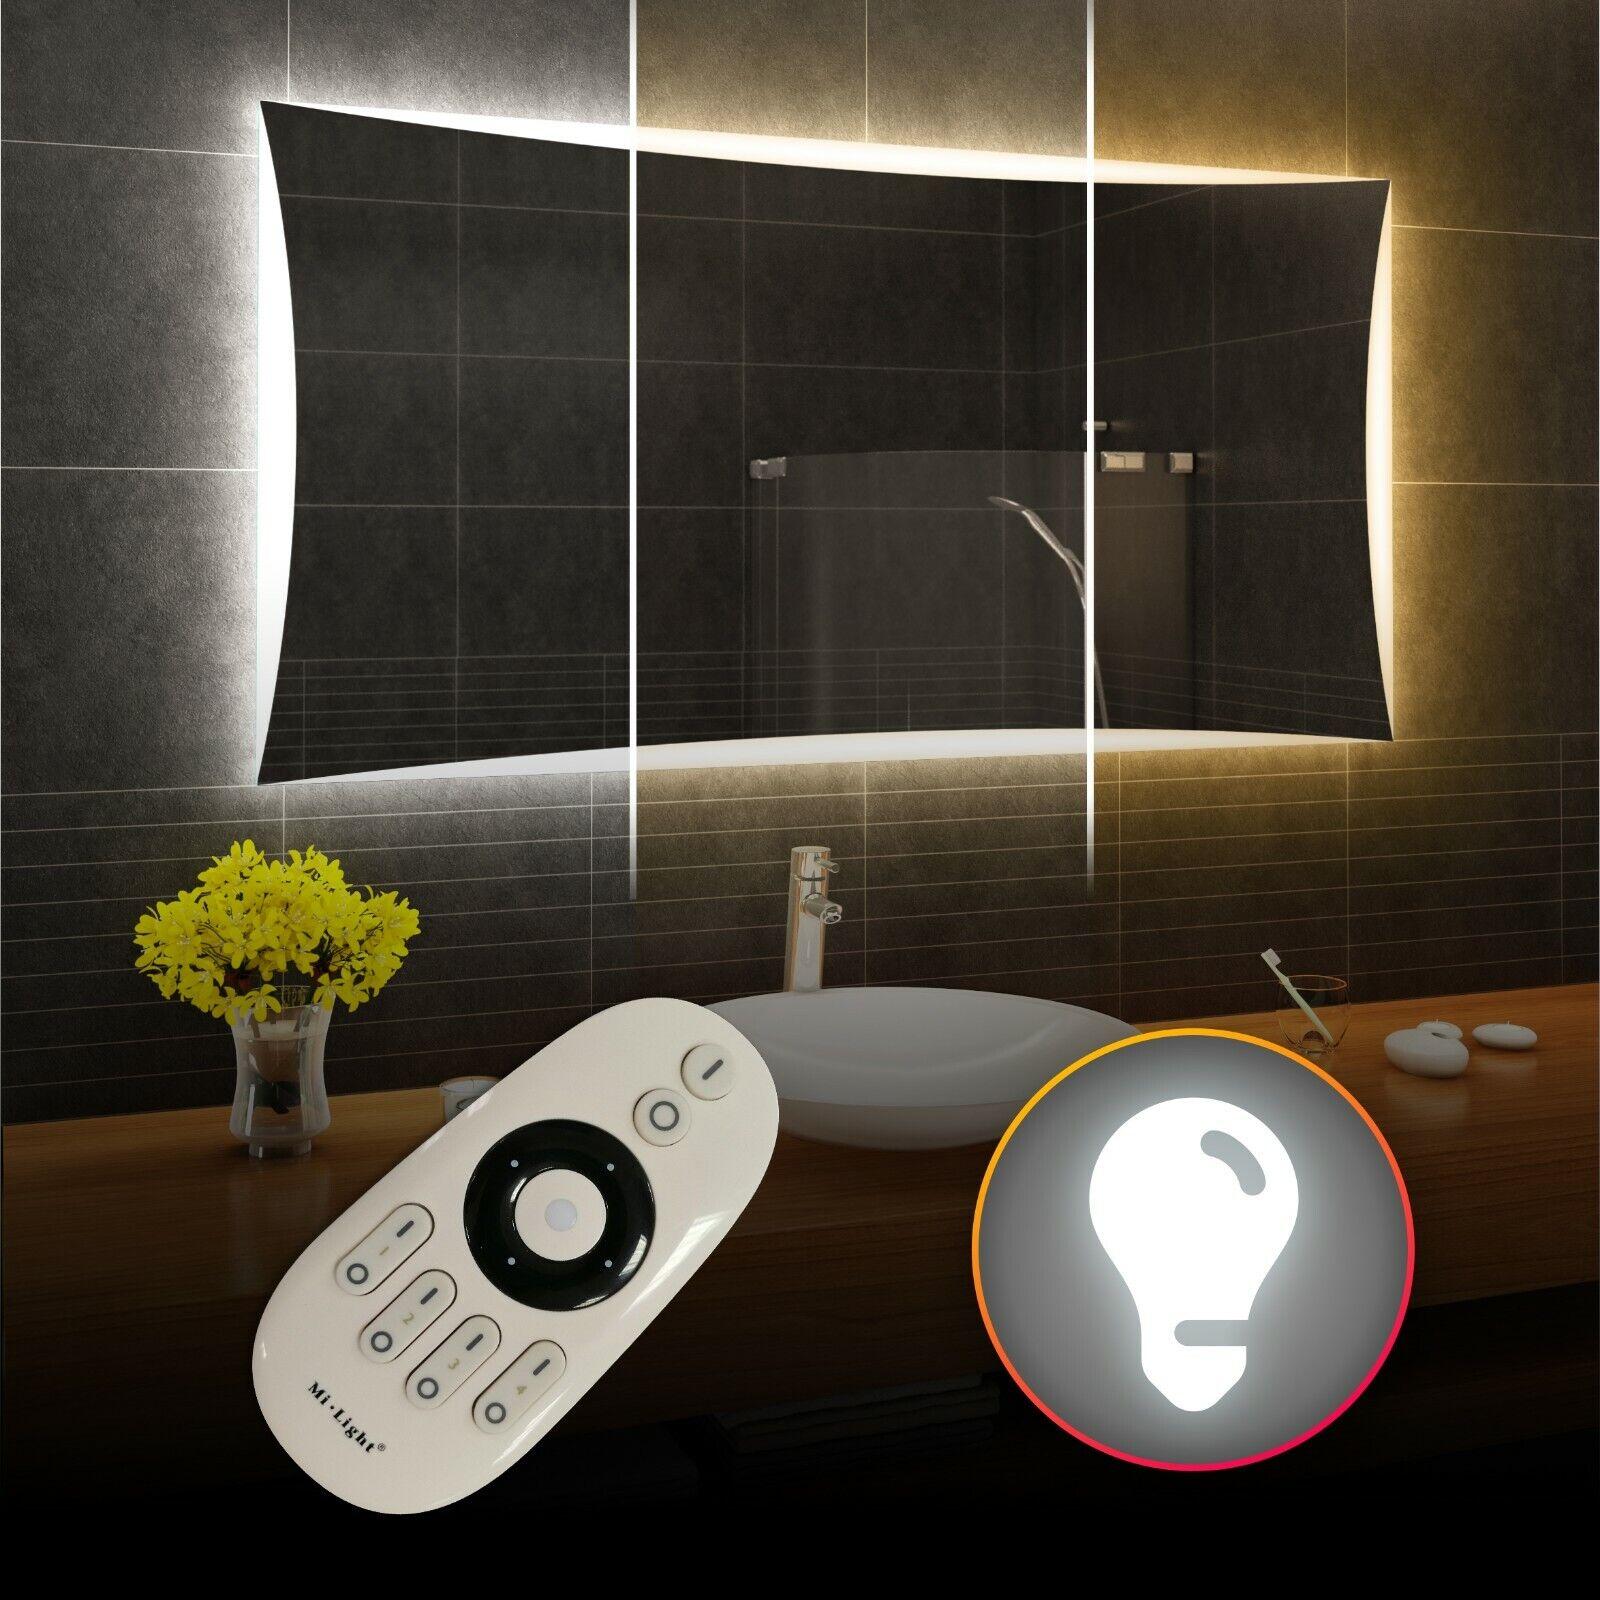 Iluminado LED Espejo De Baño   doble LED-blancoo cálido frío neutral   L77